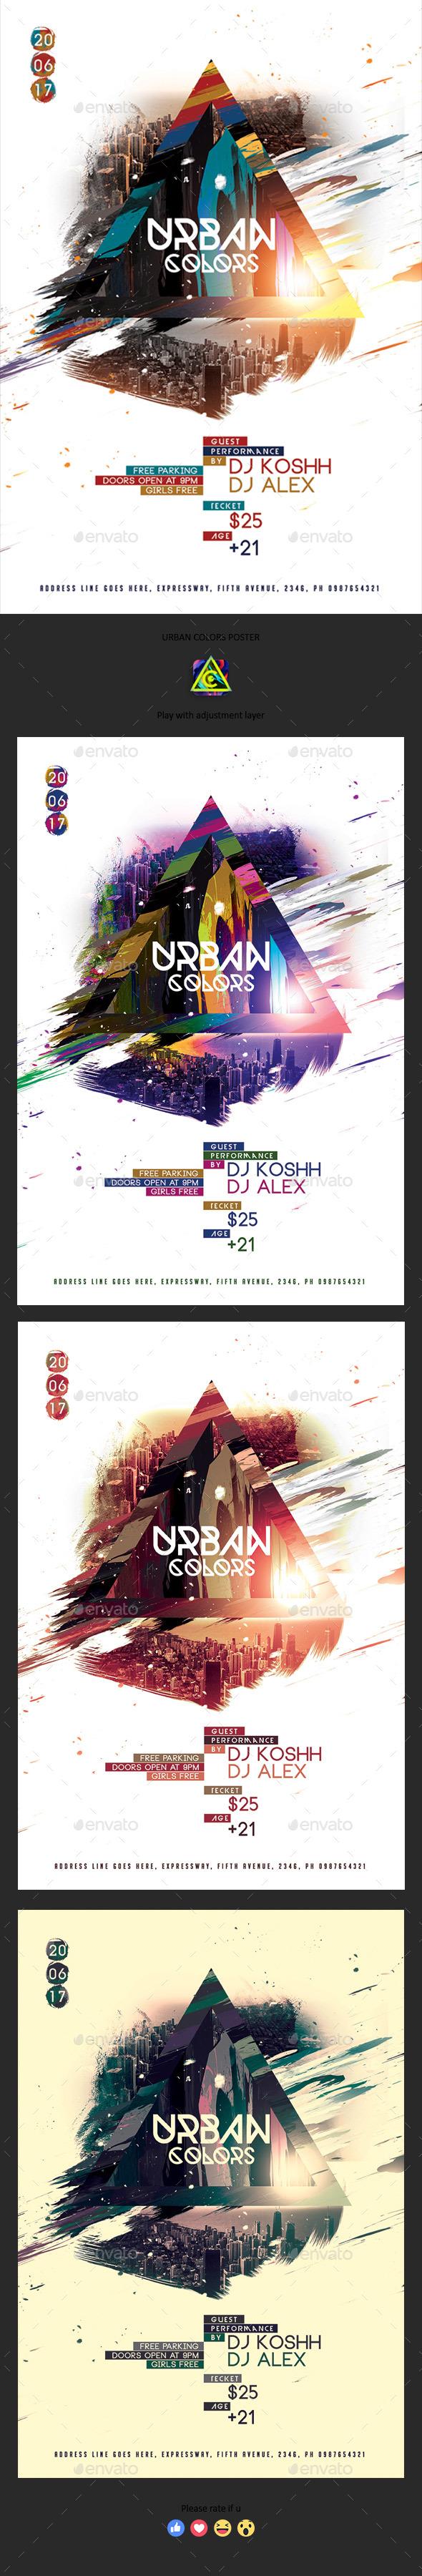 GraphicRiver Urban Colors Poster 20436639